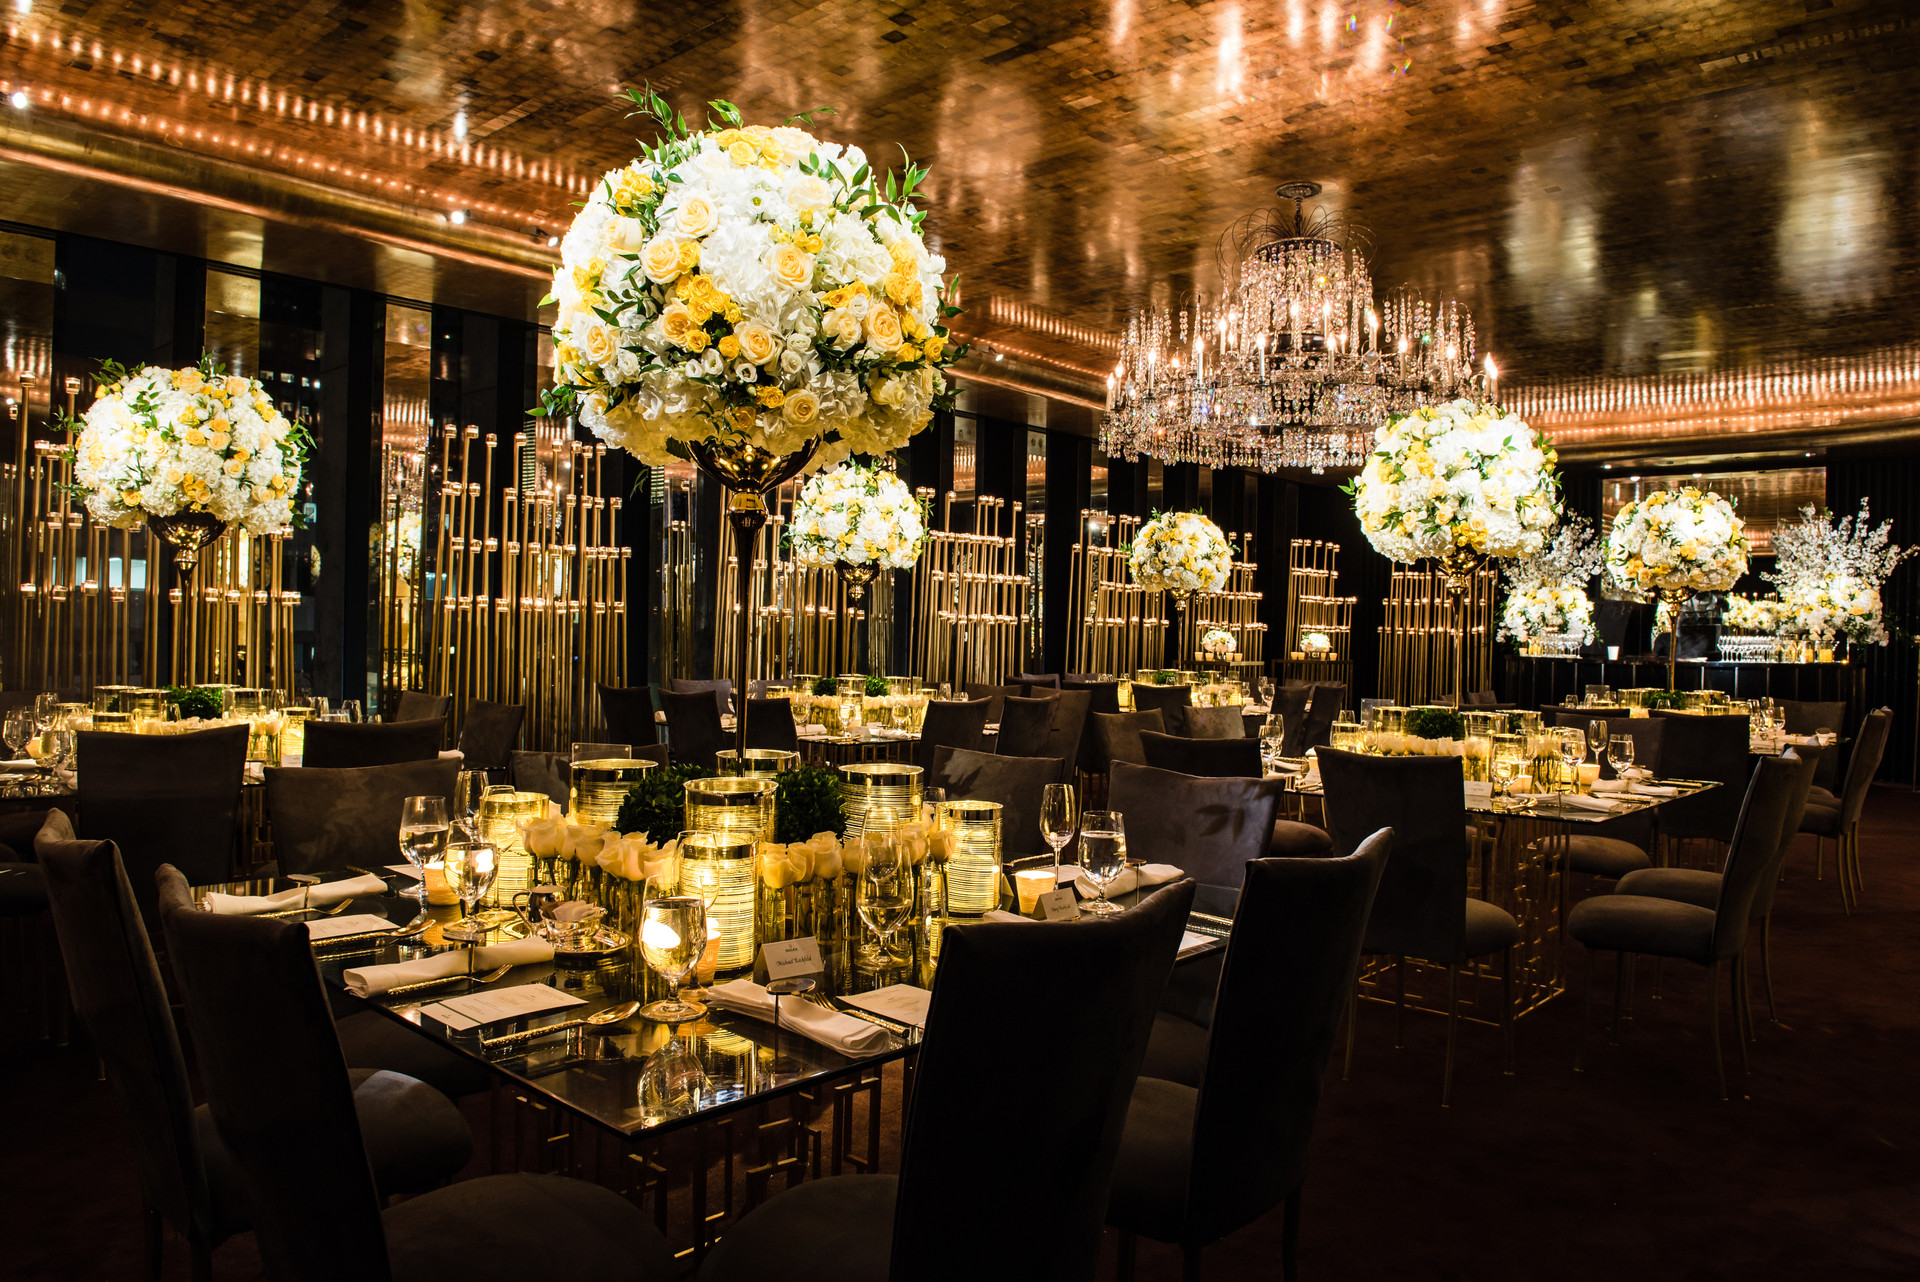 MetropolitanOpera Dinner